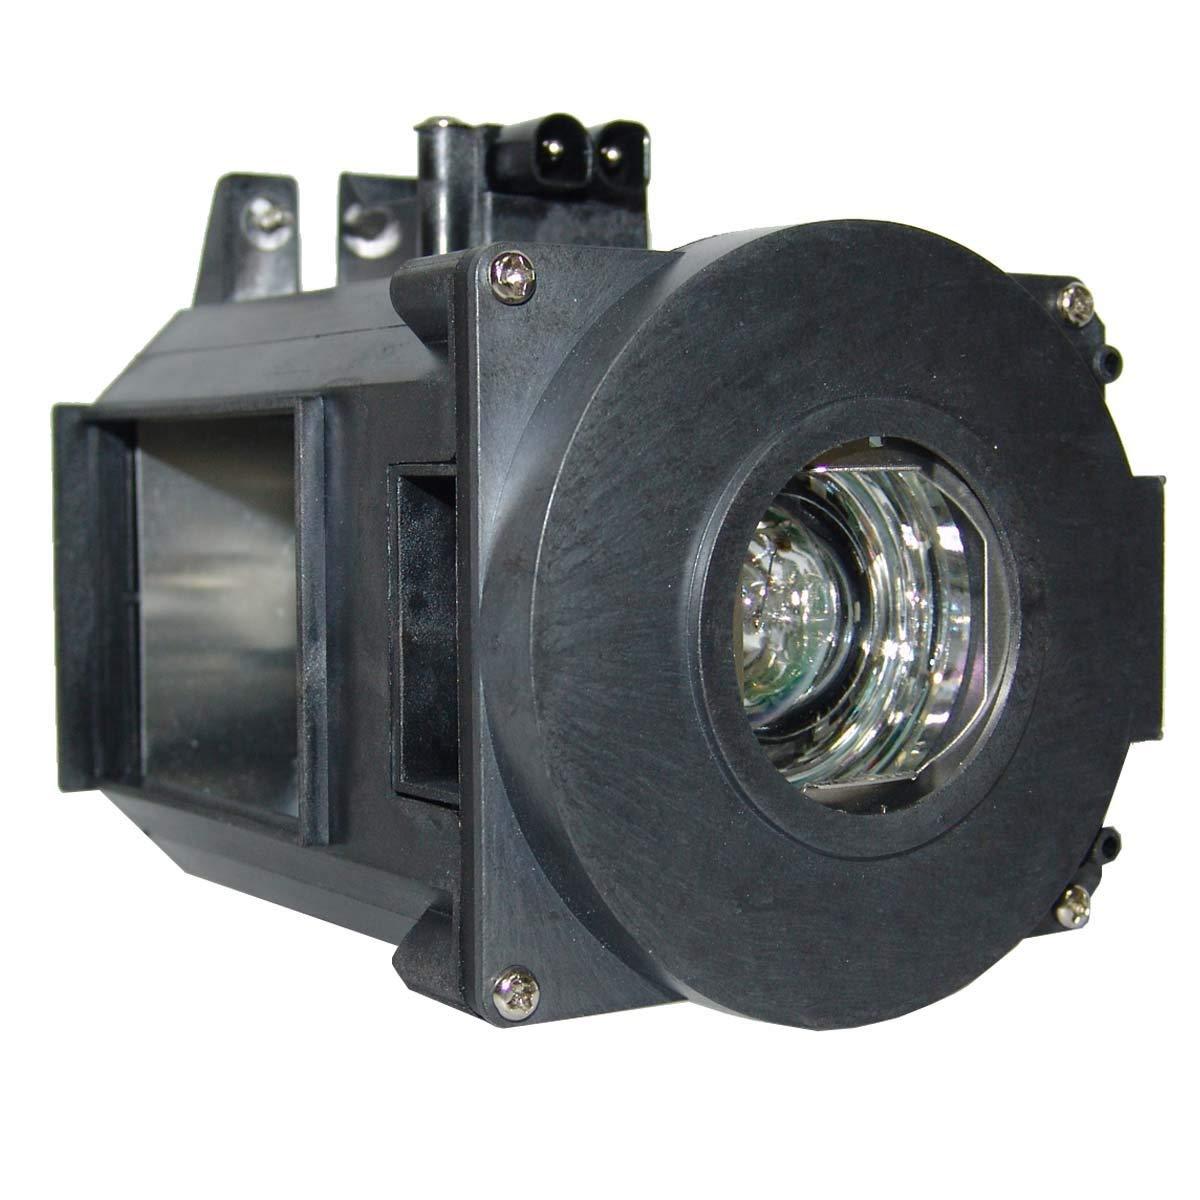 Supermait NP21LP プロジェクター交換用ランプ 汎用 150日間安心保証つき NP-PA500U NP-A500X / NP-PA5520W NP-PA600X / PA550W / PA500U / PA500X / PA600X 対応 B0775JY3LK